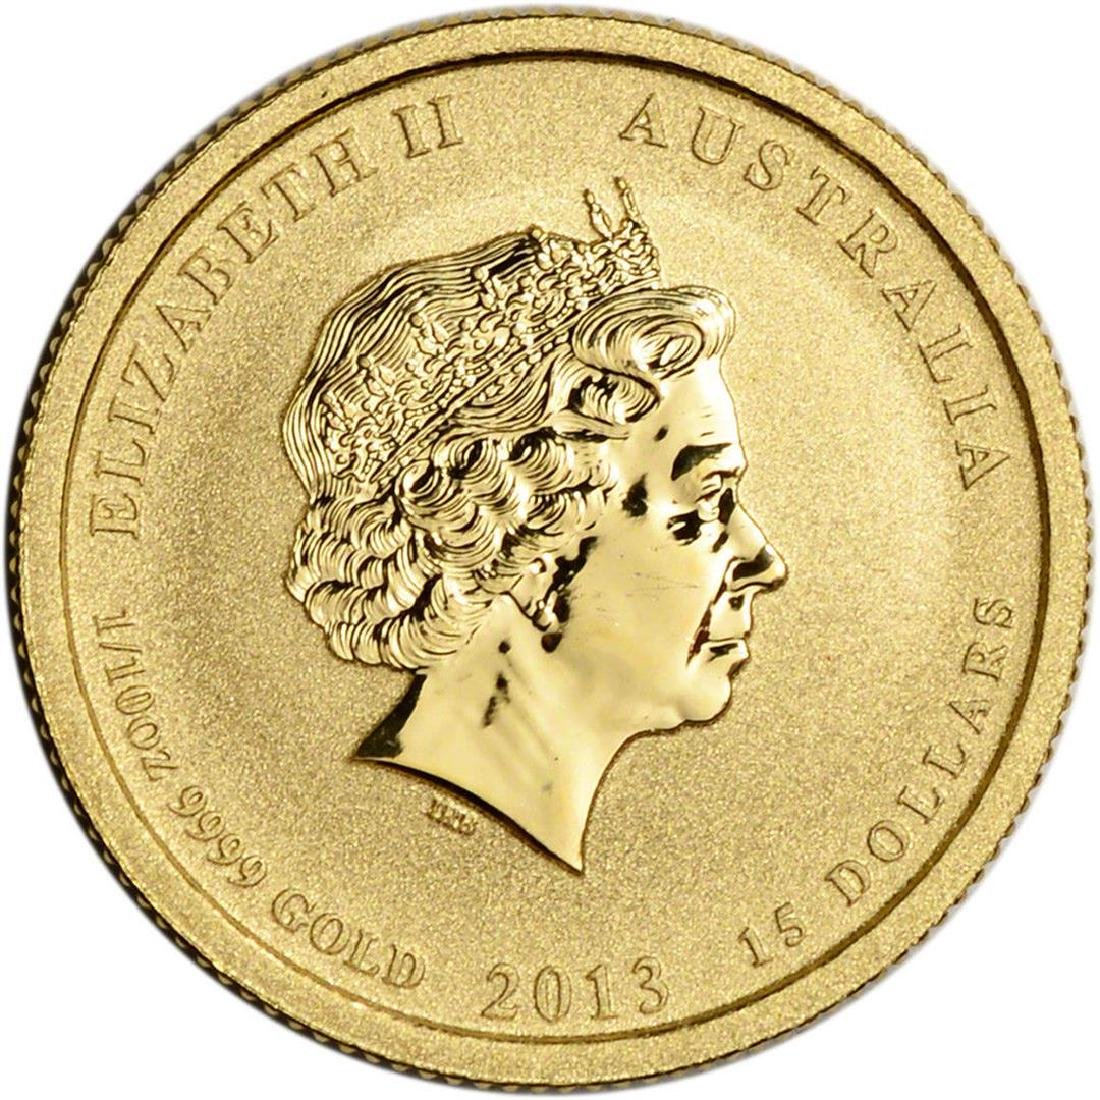 2013 $15 Australia War in the Pacific 1/10 oz Gold Coin - 2